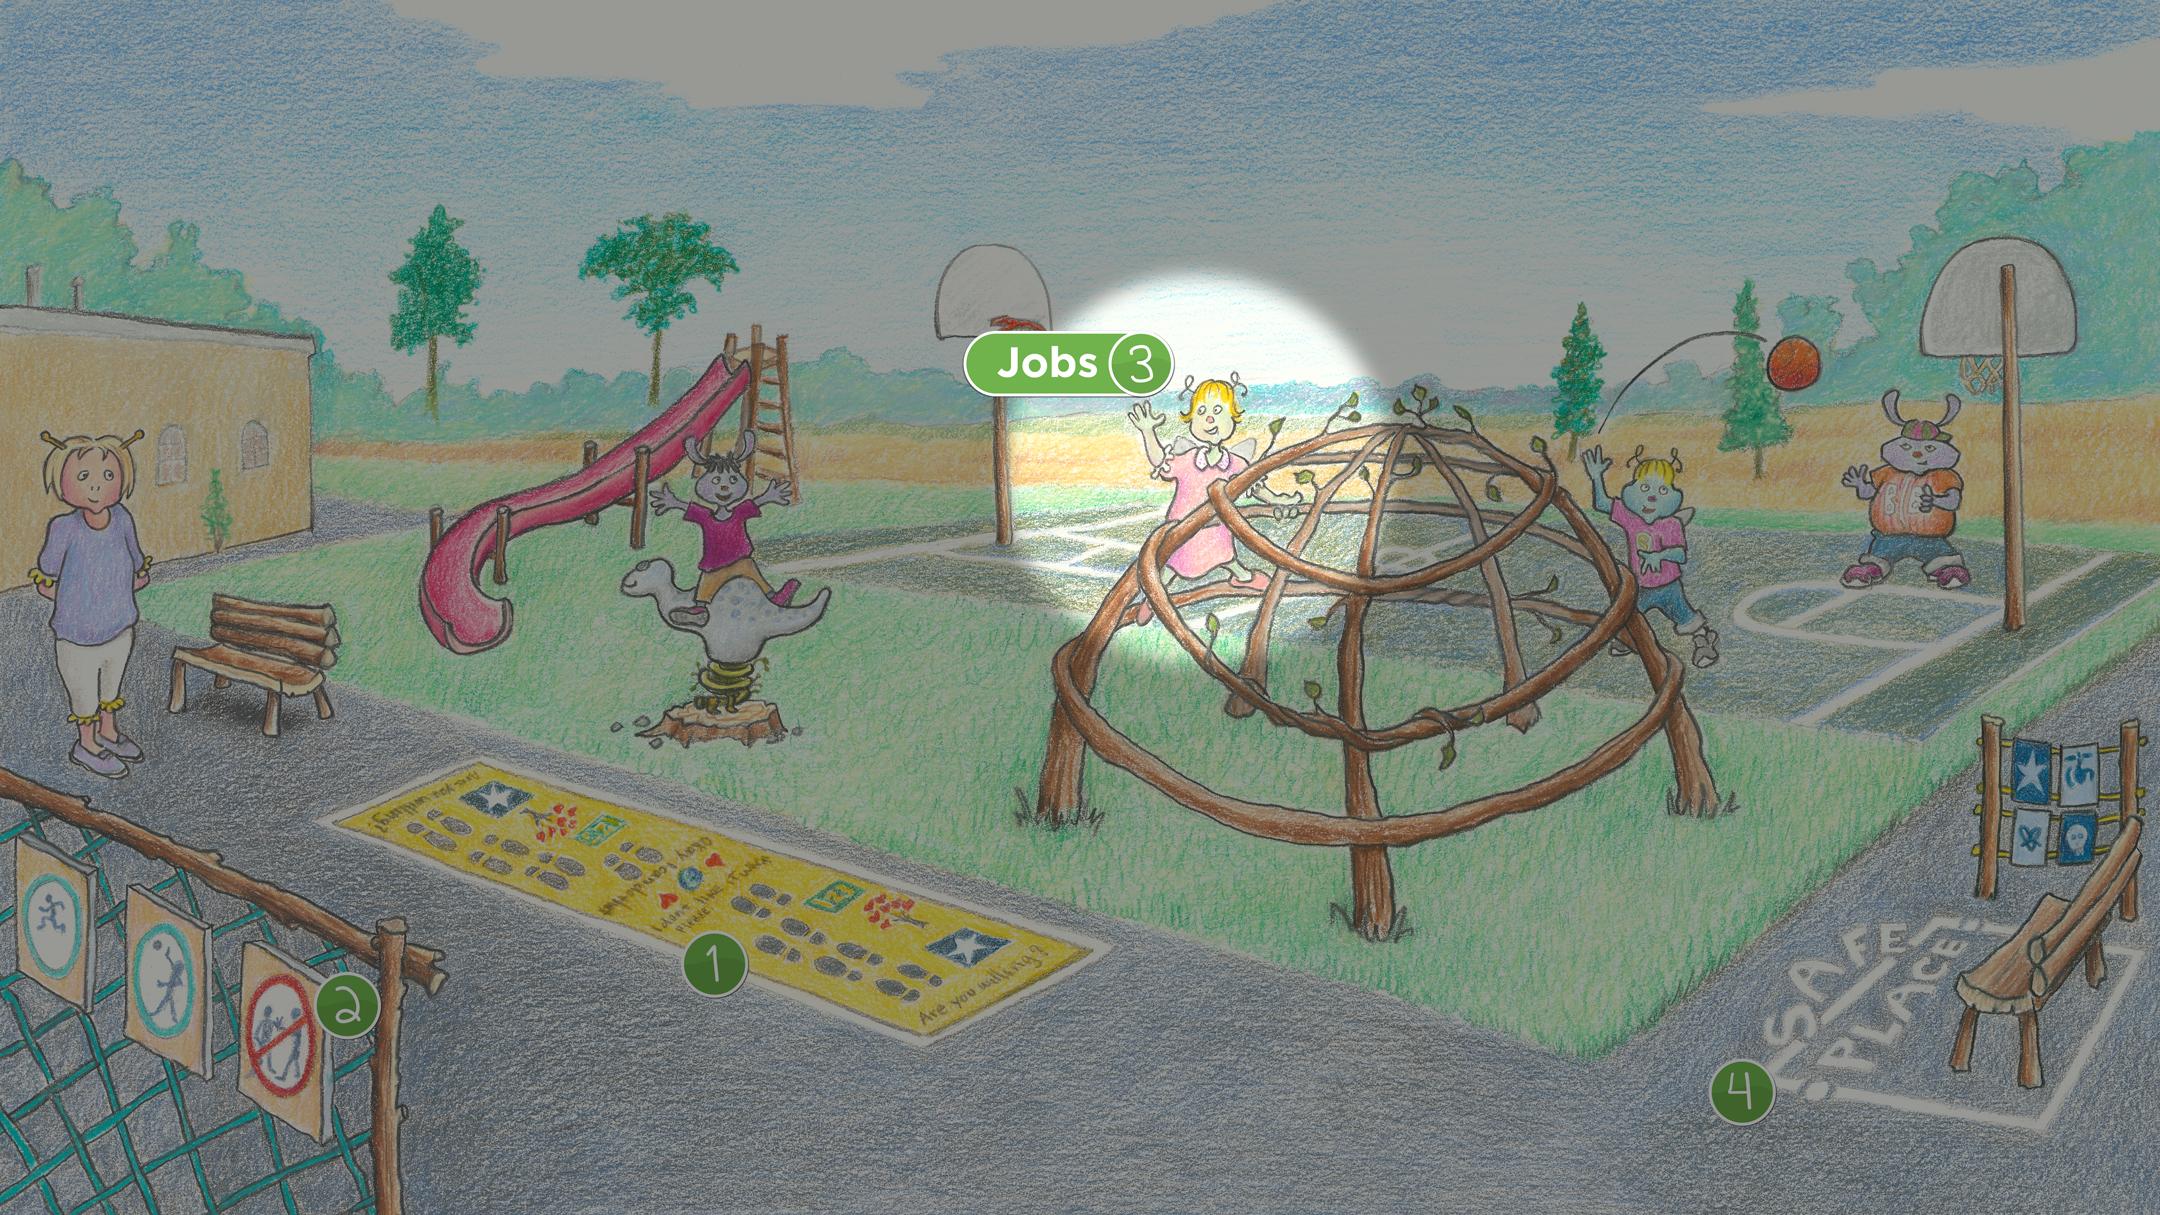 Playground: Jobs